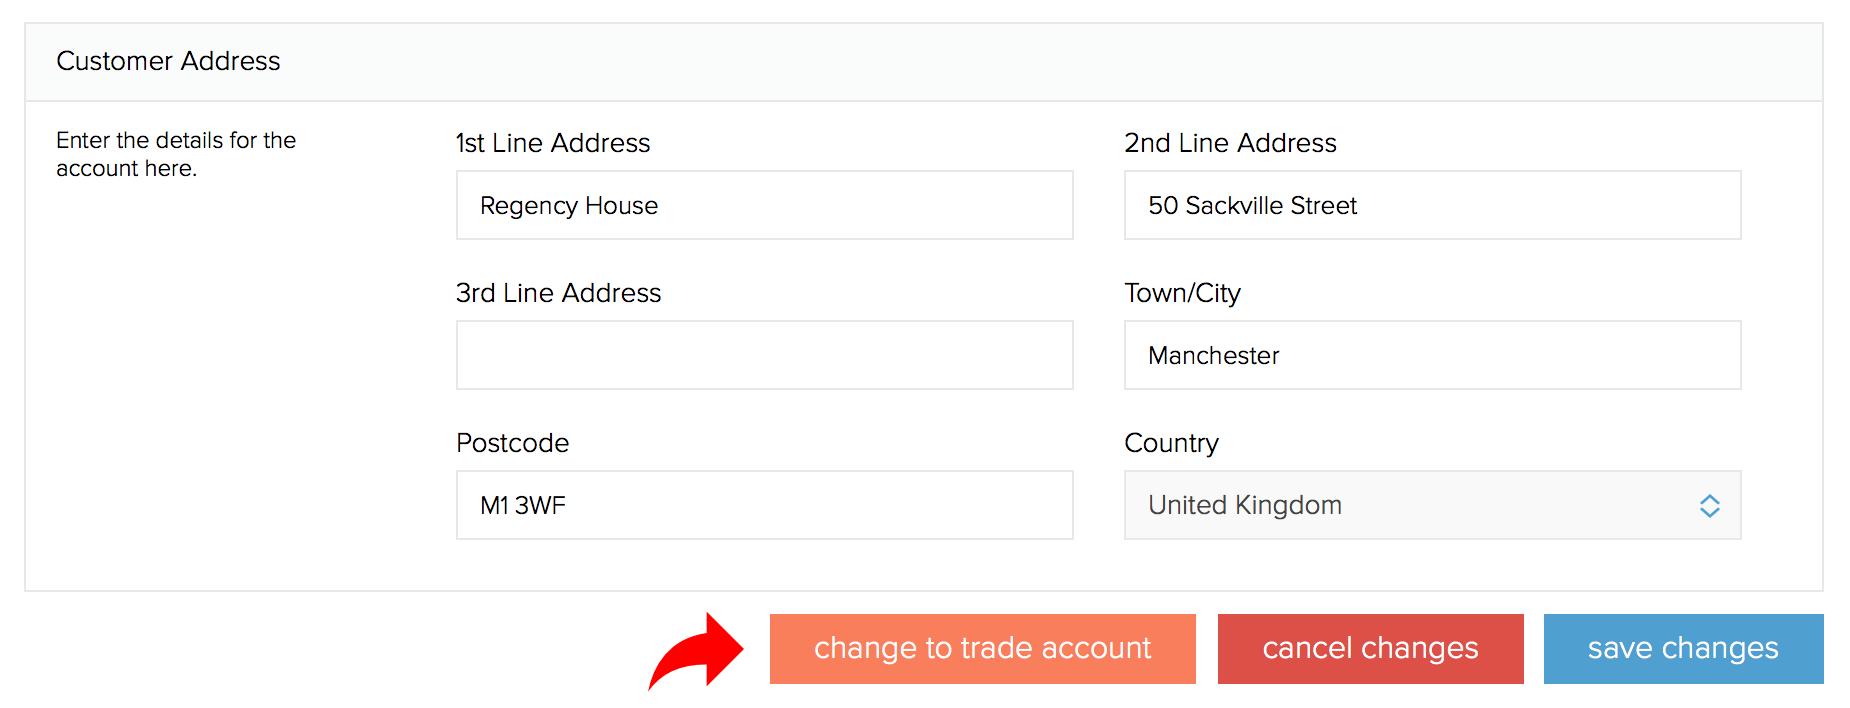 Uk/customer/account/create - Uk/customer/account/create 39